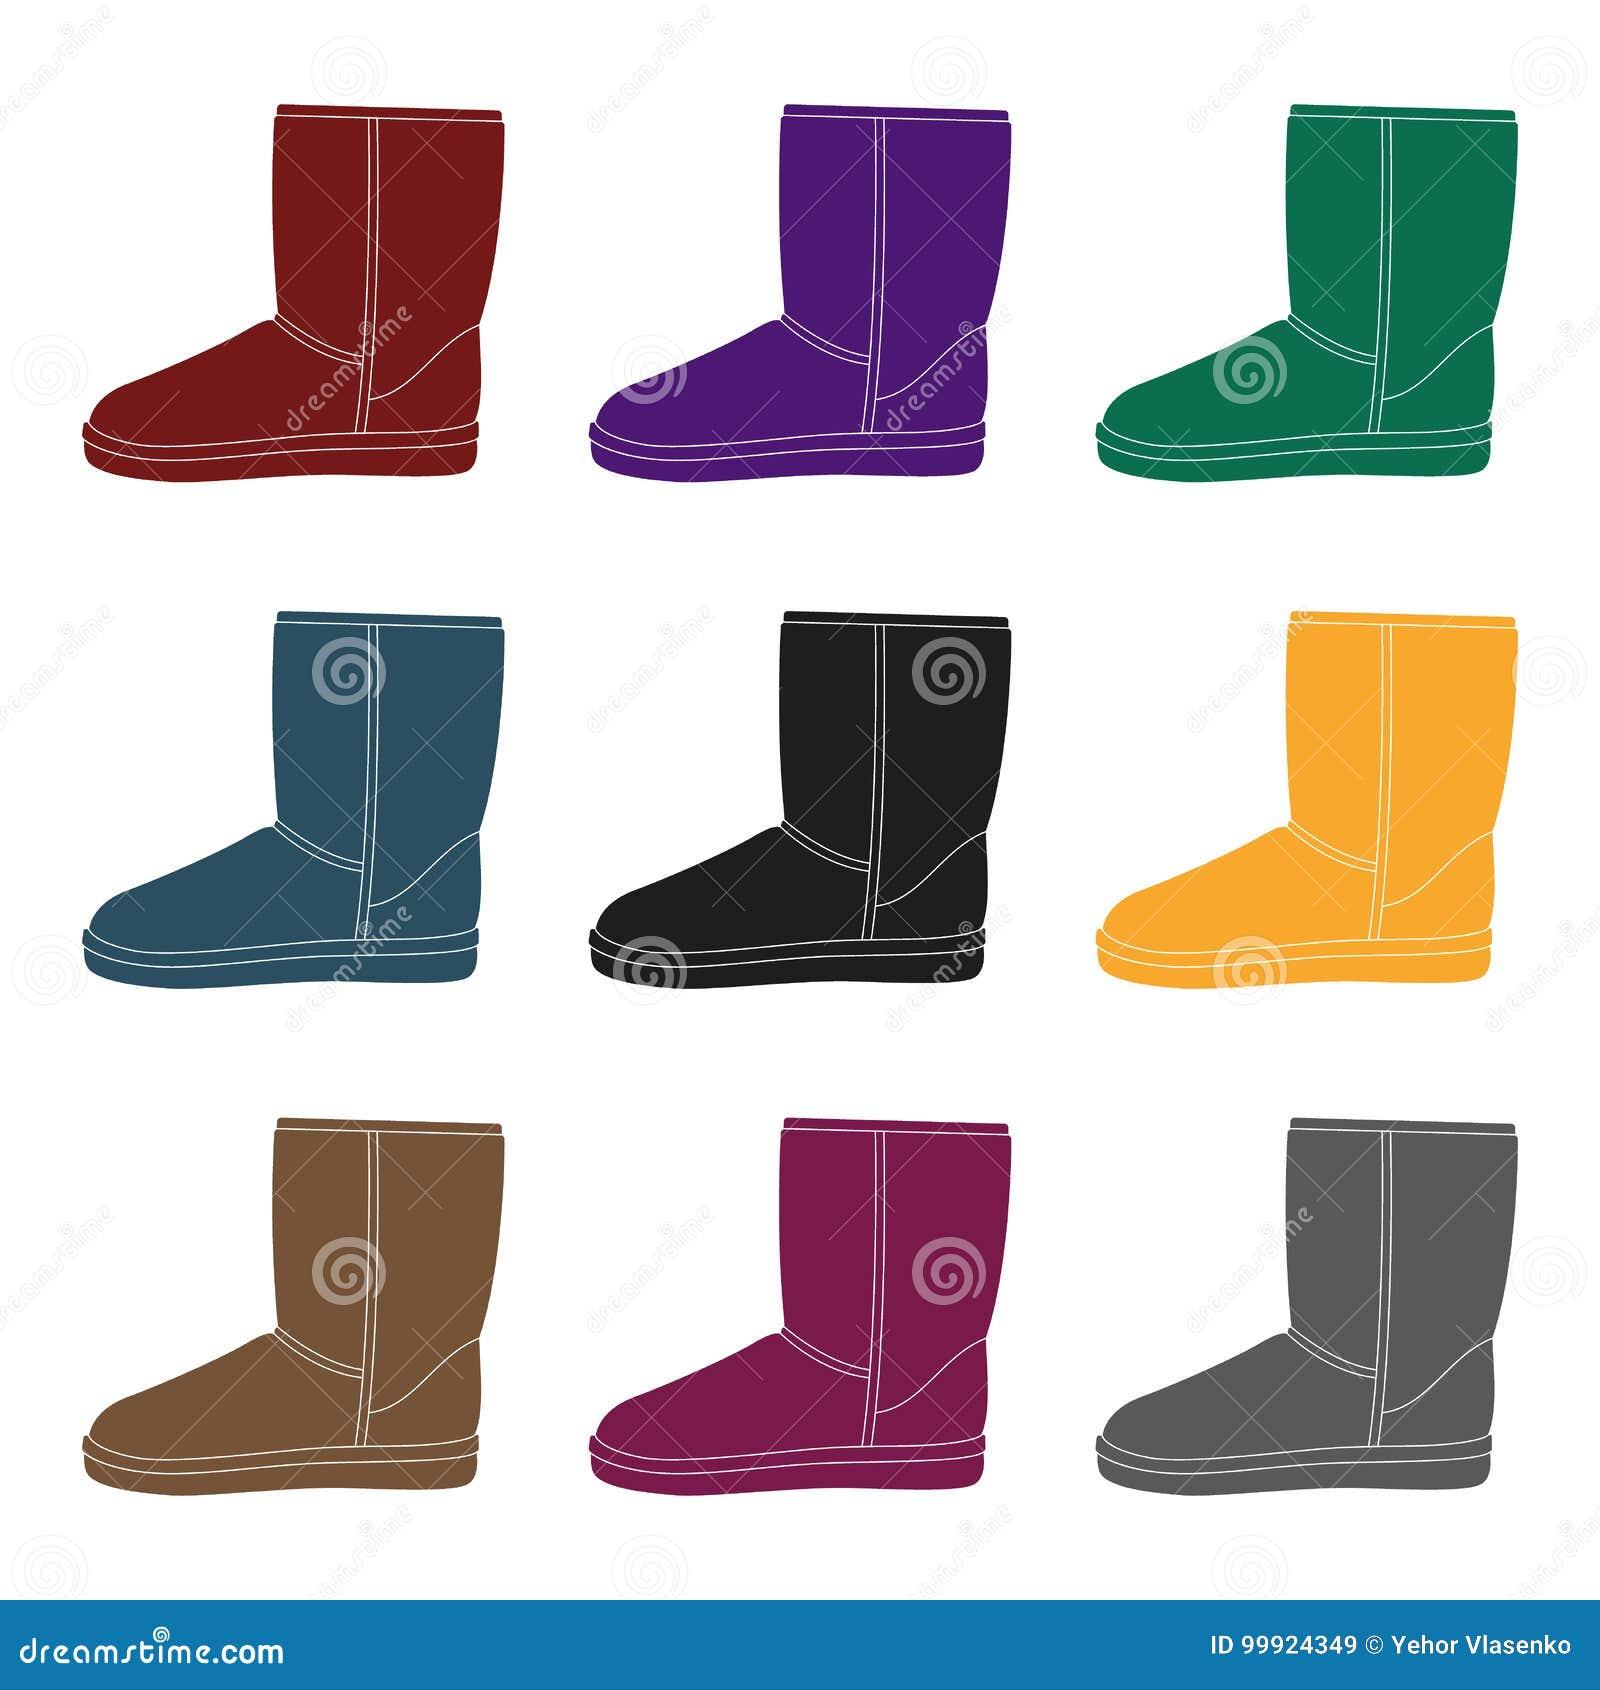 4f0de4db0e Θερμές μπότες χειμερινού μπλε ugg Άνετα χειμερινά παπούτσια για την  καθημερινή ένδυση Διαφορετικό ενιαίο εικονίδιο παπουτσιών στη μαύρη  απεικόνιση Ιστού ...